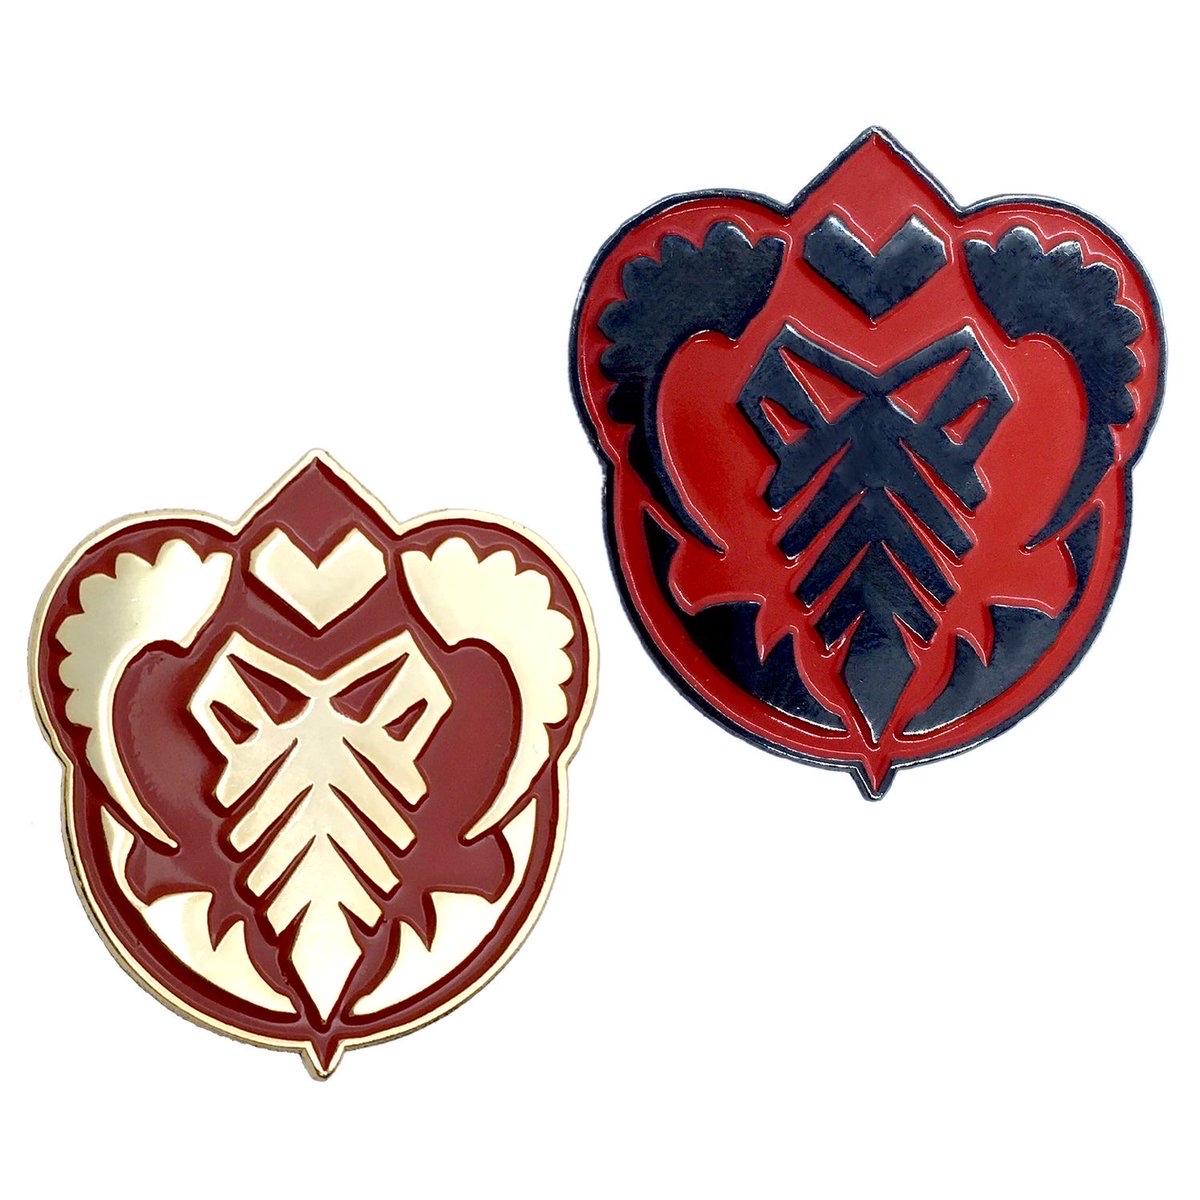 Get these #BigVanVader tribute pins at  • #forsale #pinsale #enamelpins #itsvadertime #prowrestling #wrestlingpins #wcw #wwe #wwf #njpw #80swrestling #leonwhite